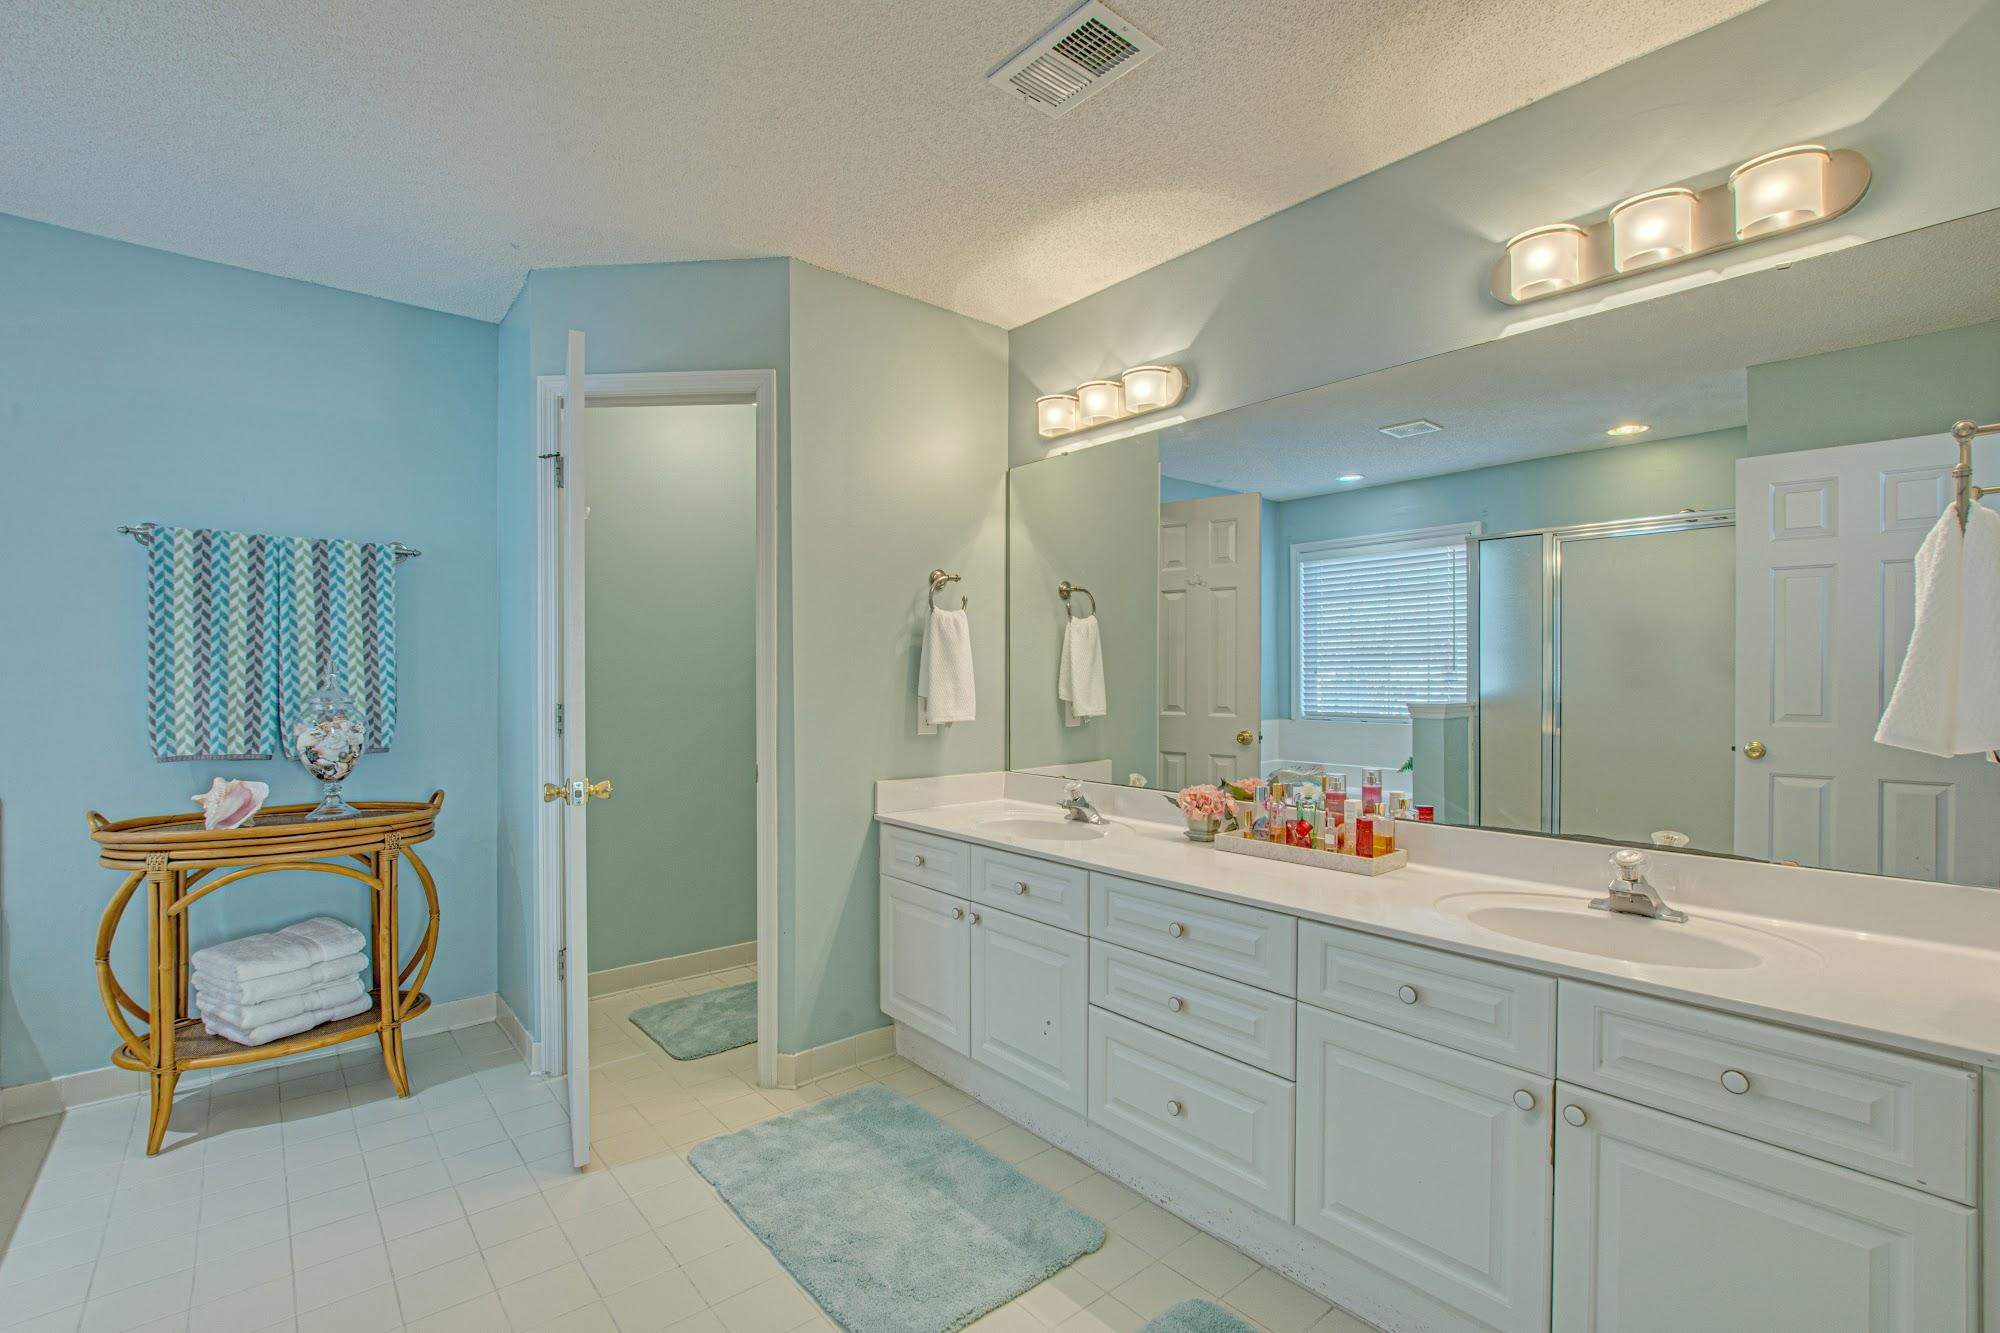 Indigo Fields Homes For Sale - 5512 Rowsham, North Charleston, SC - 8